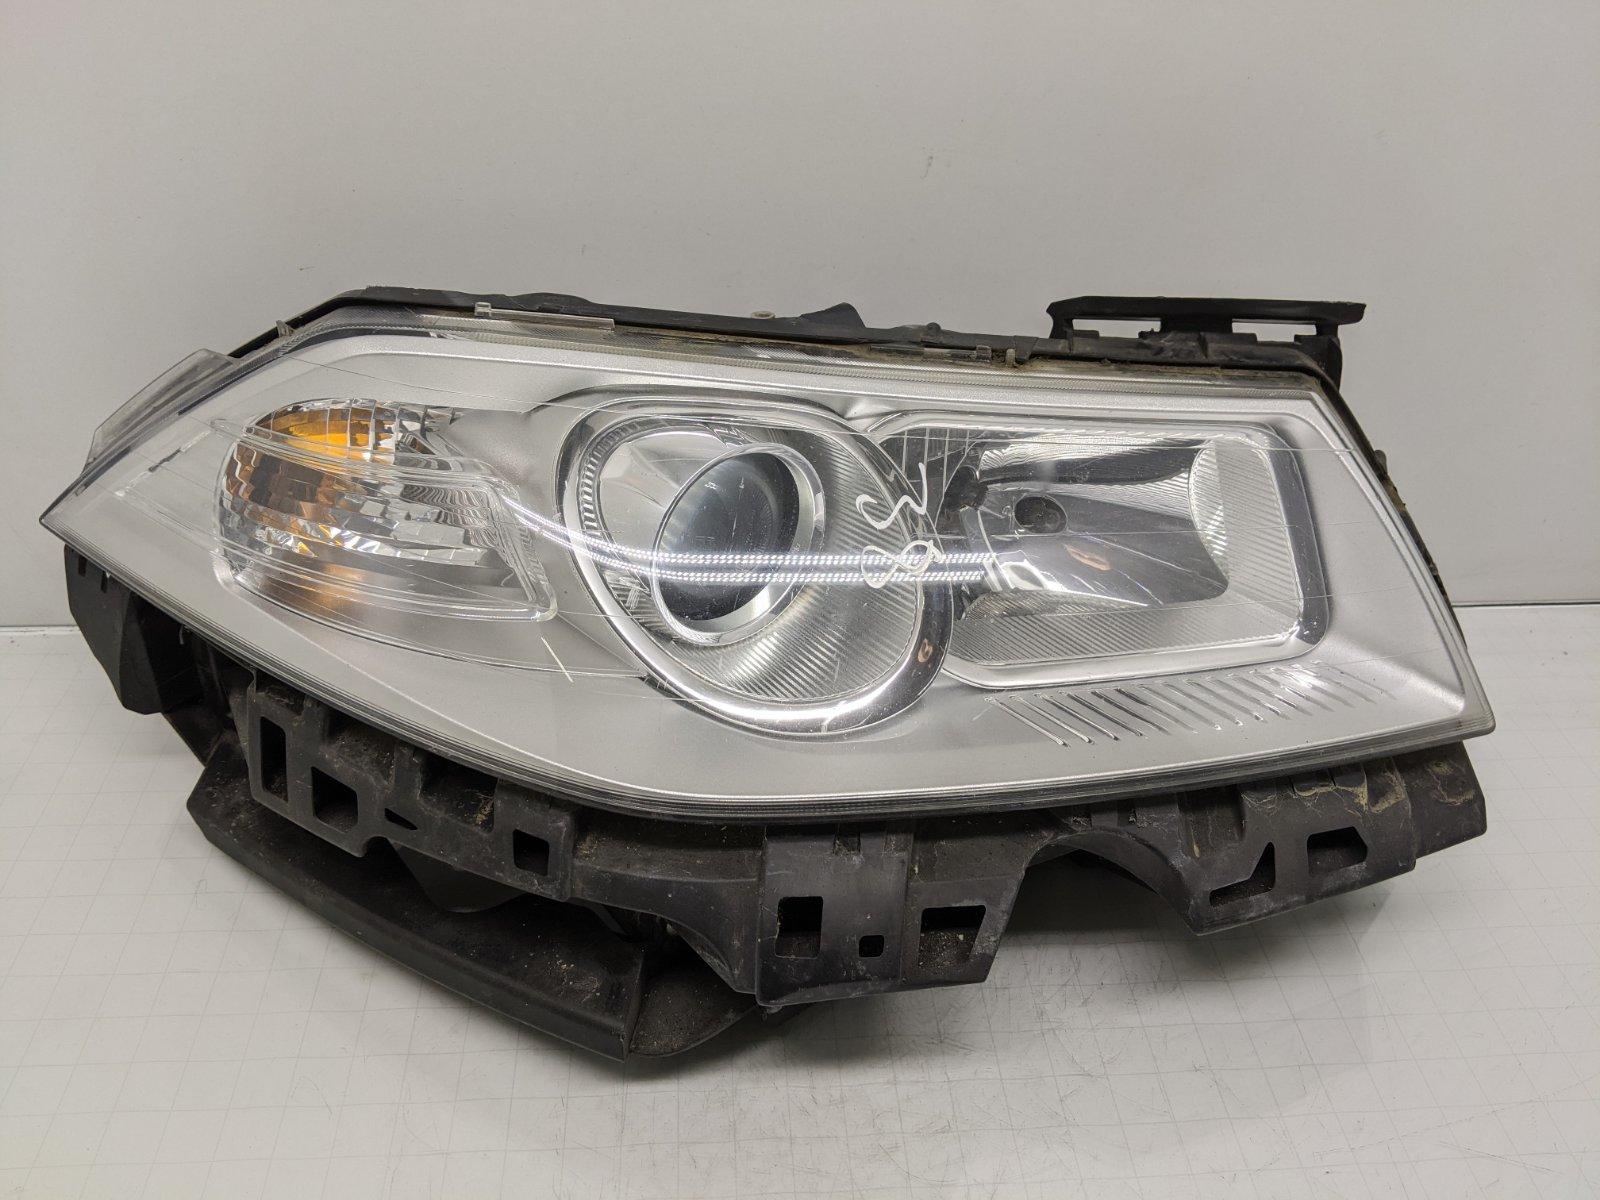 Фара правая Renault Megane 1.5 DCI 2006 (б/у)